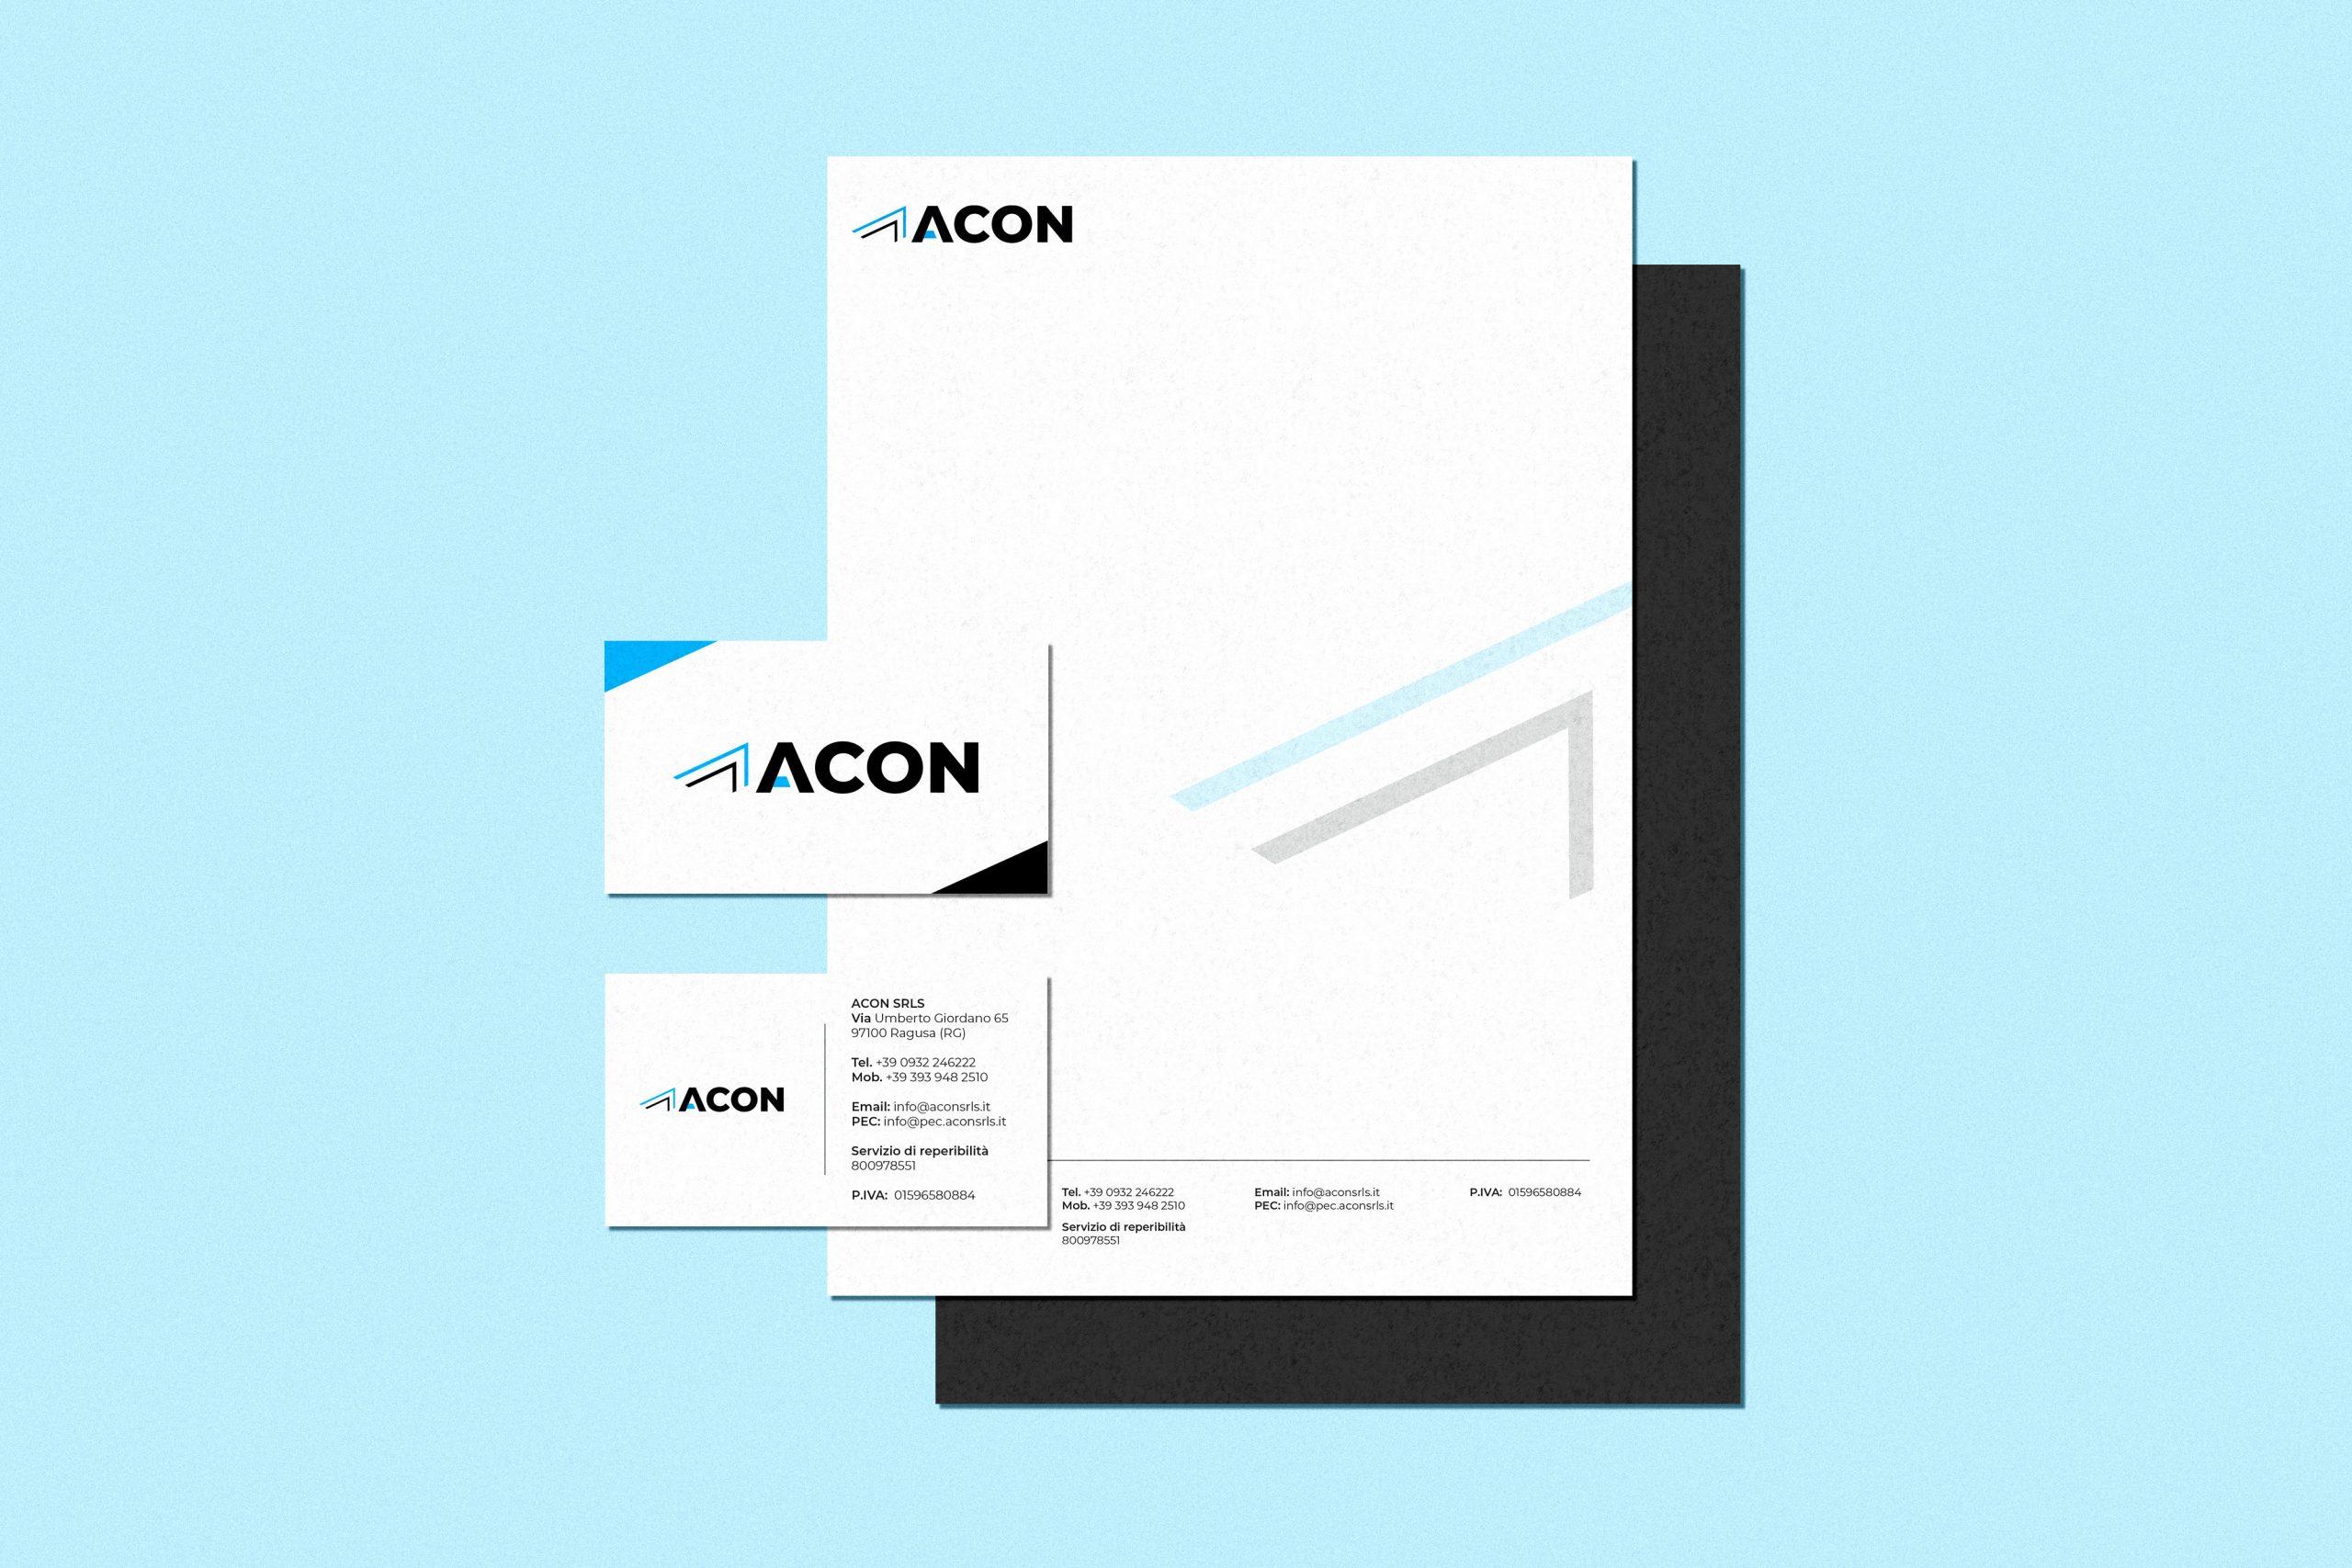 Acon-intestata-pressh24-jpg